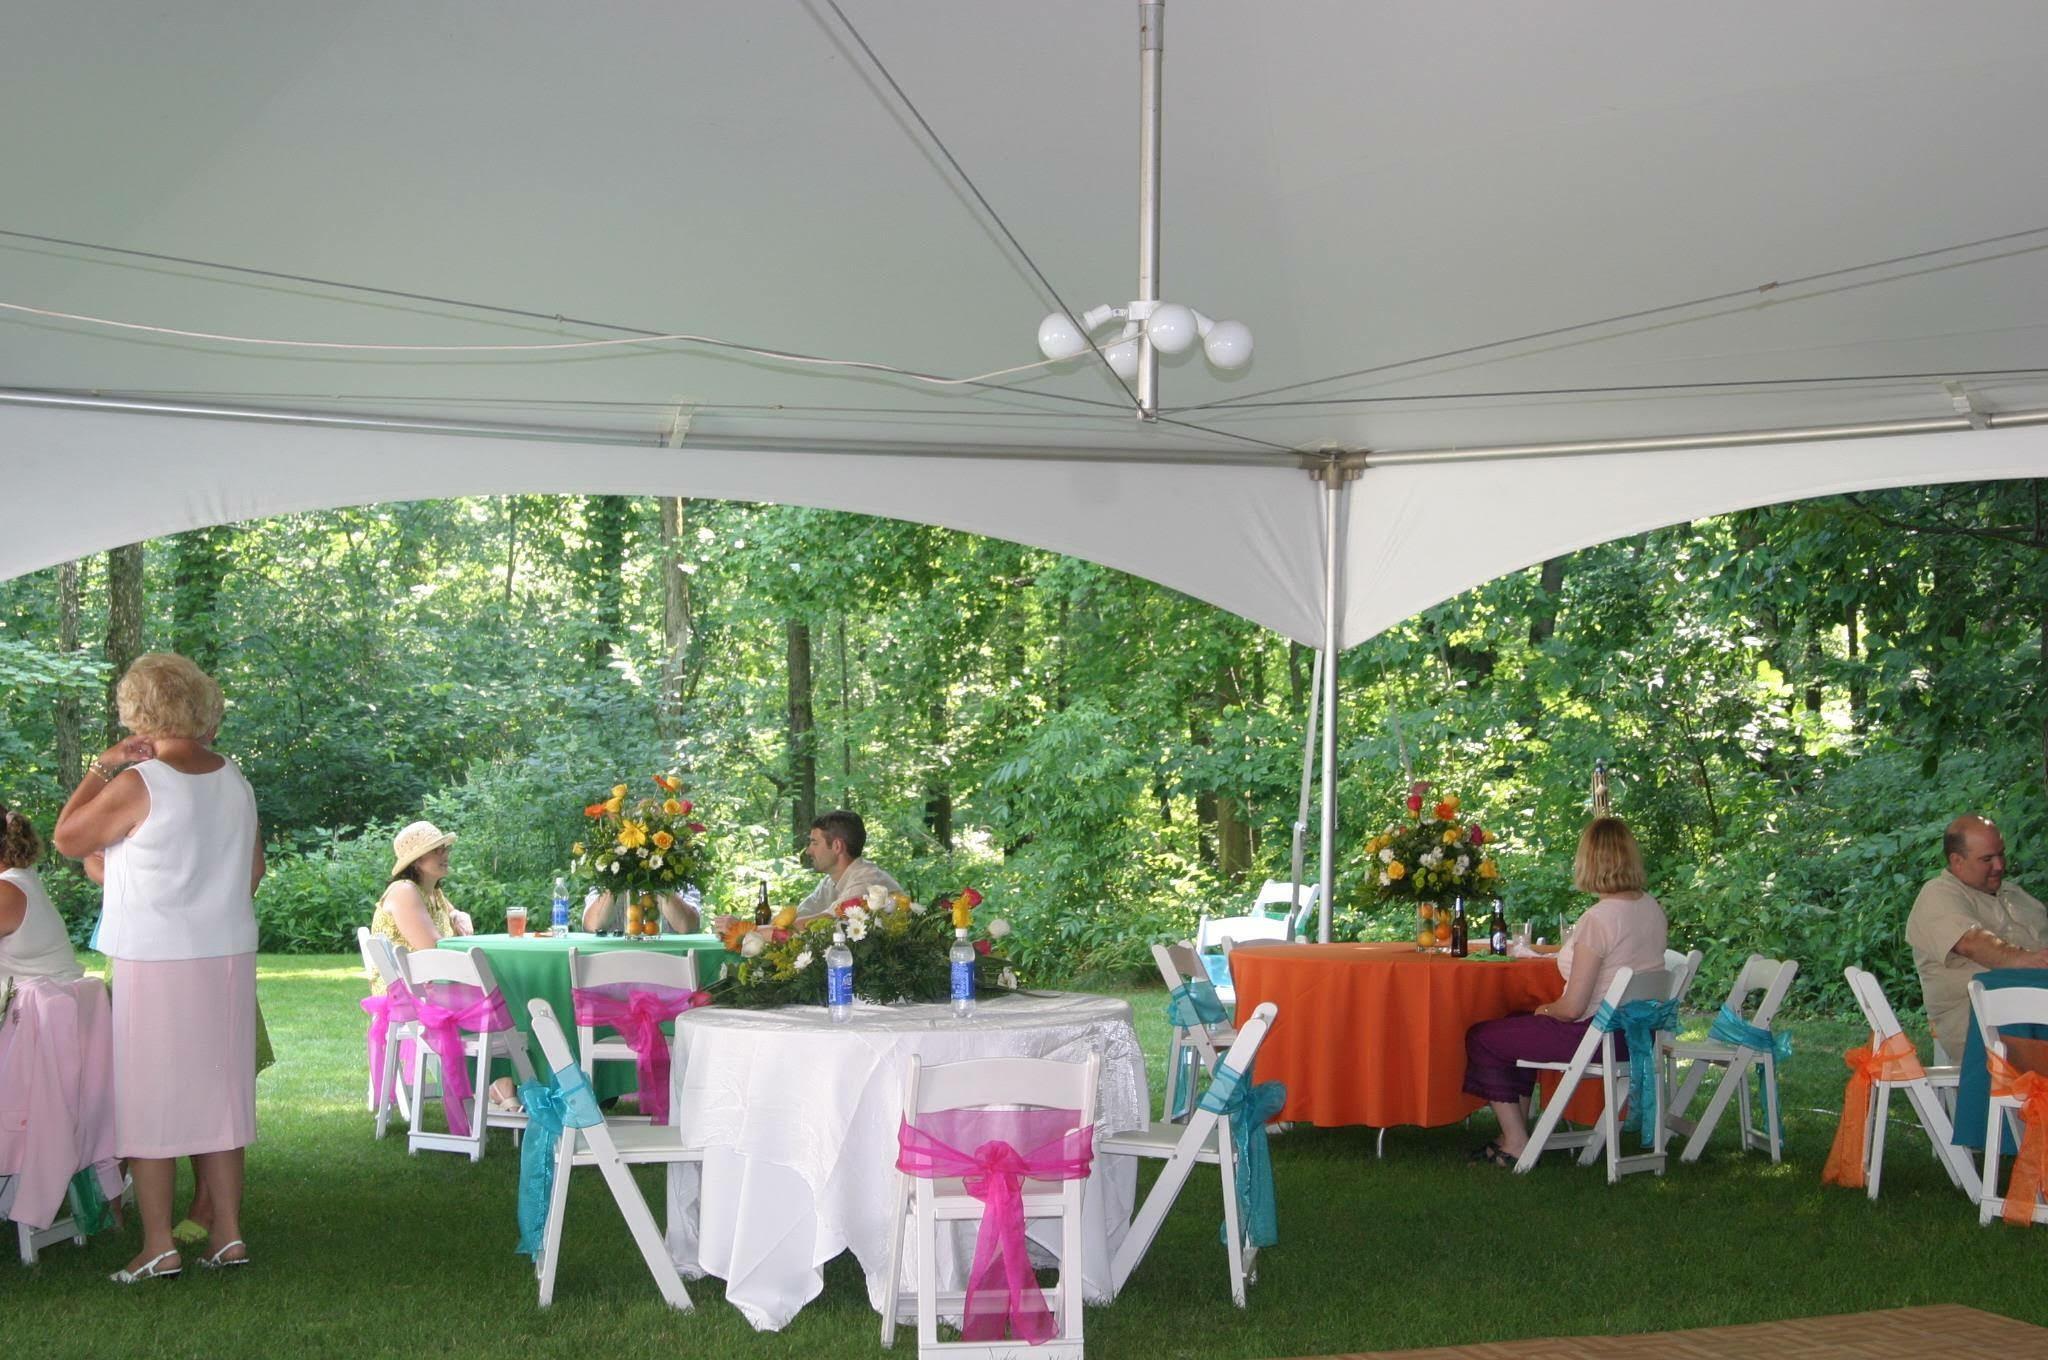 pittsburgh-tent-wedding-9.jpg